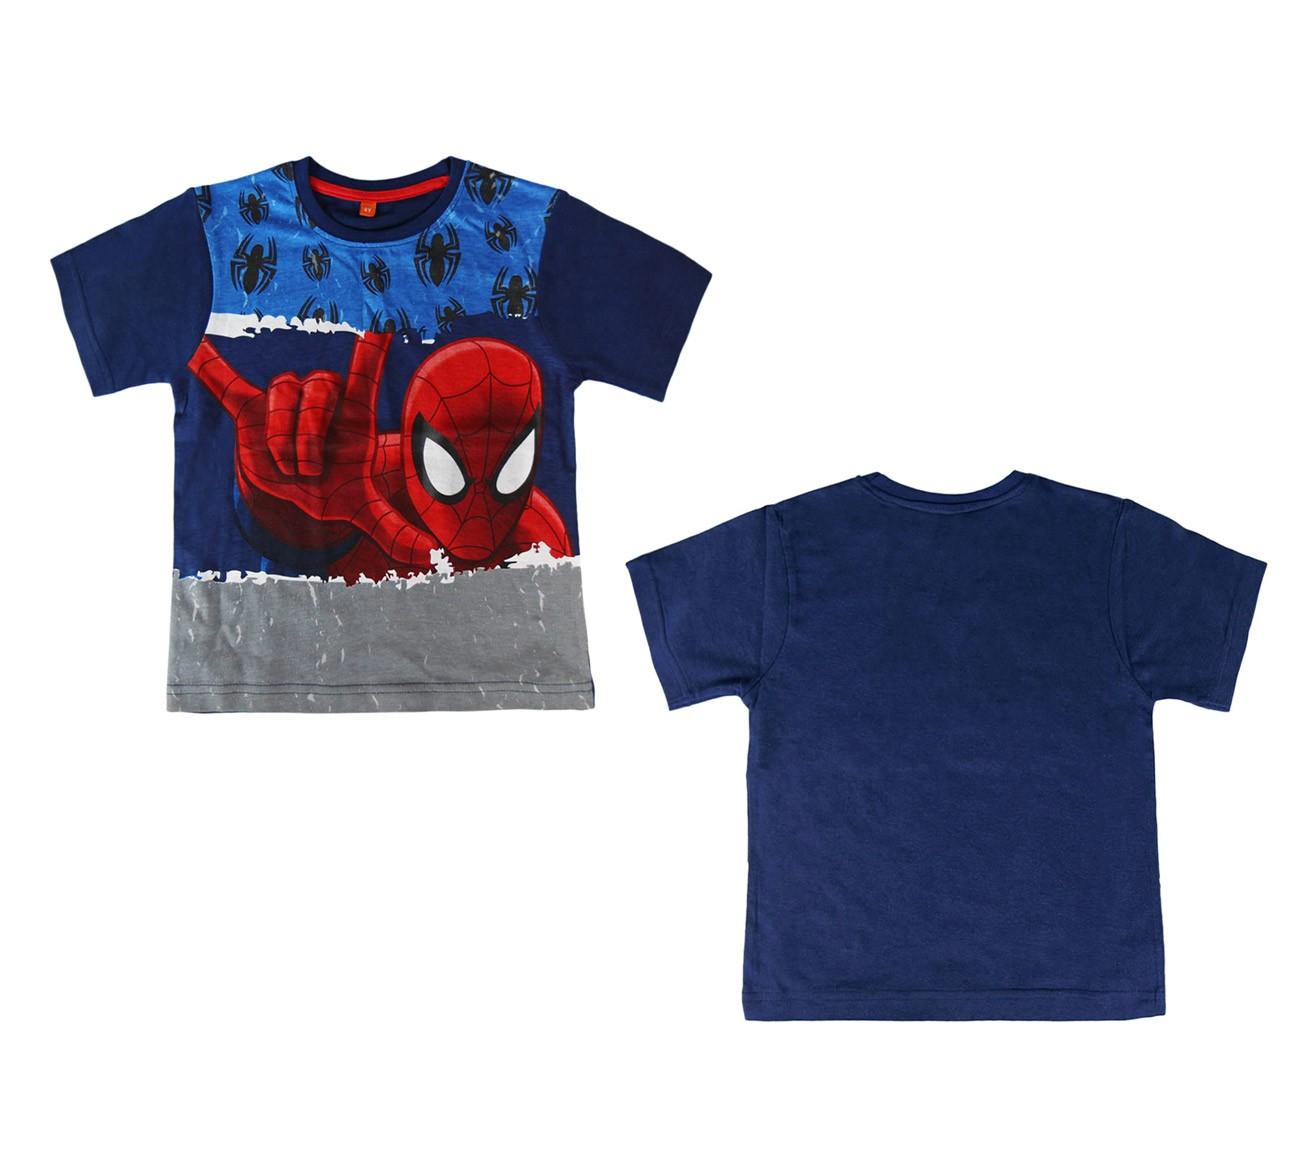 T-shirt-da-bambino-di-SPIDERMAN-2200001951-in-cotone-taglie-da-4-a-8-anni miniatura 6